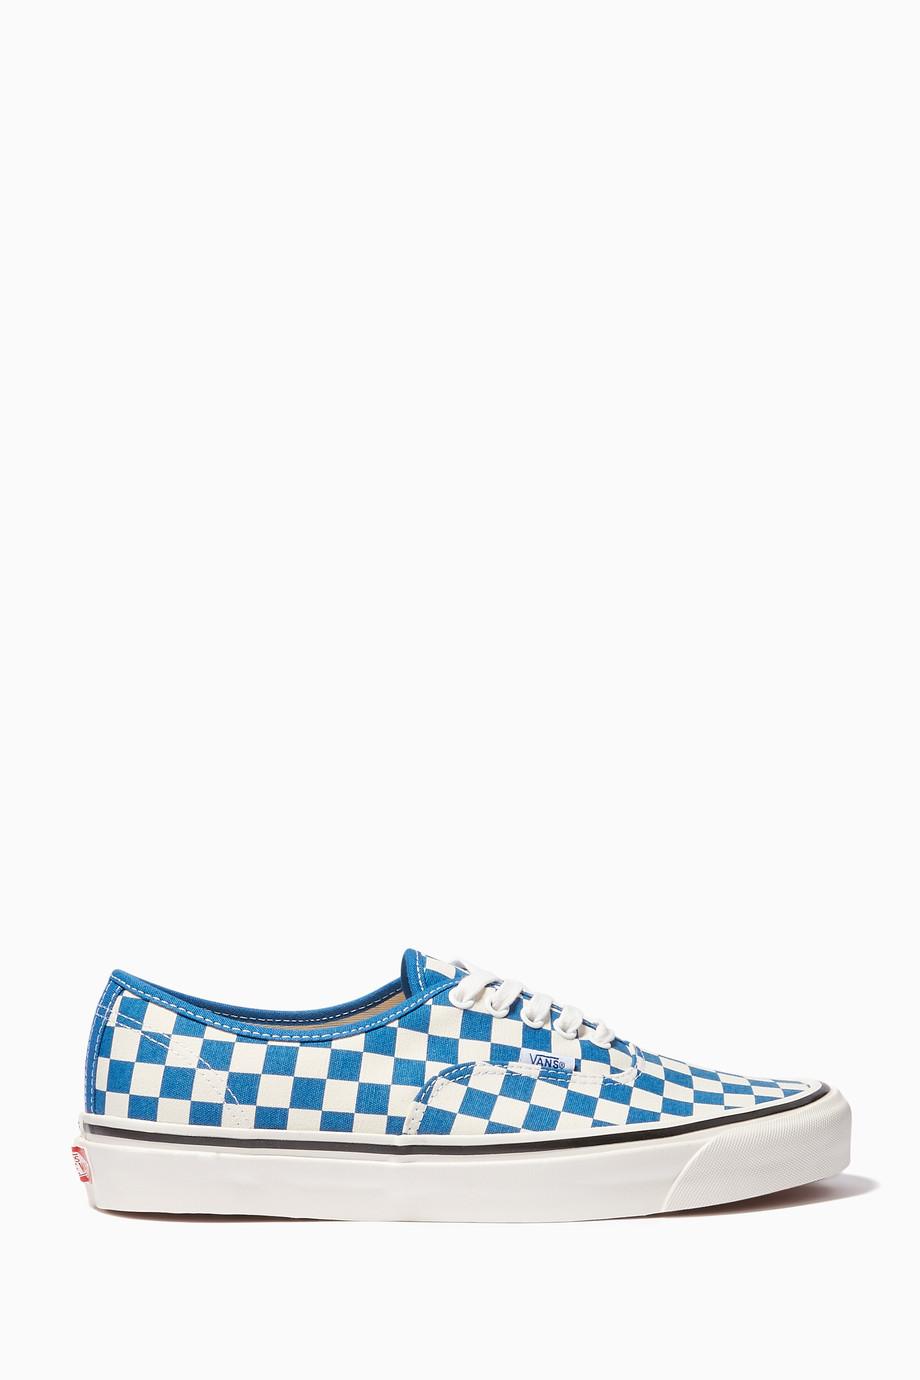 68142e165 تسوق حذاء سنيكرز أوثنتيك أناهايم فاكتوري فانس أزرق للرجال | اُناس ...